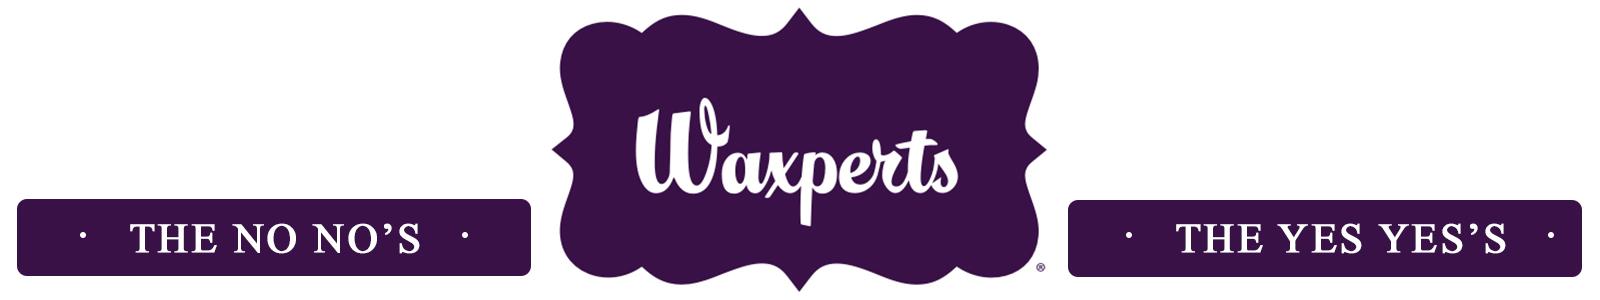 Waxperts 2.jpg